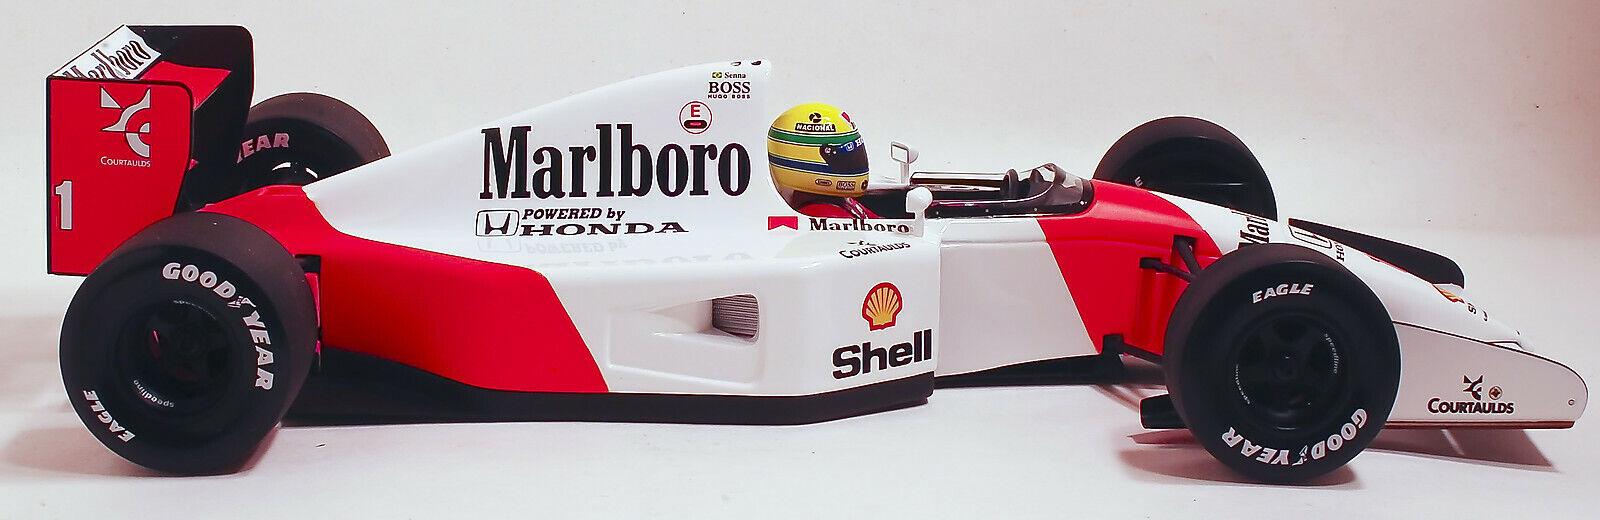 1 18 Ayrton Senna 1992 McLaren Honda MP4 7 FULL LIVERY n